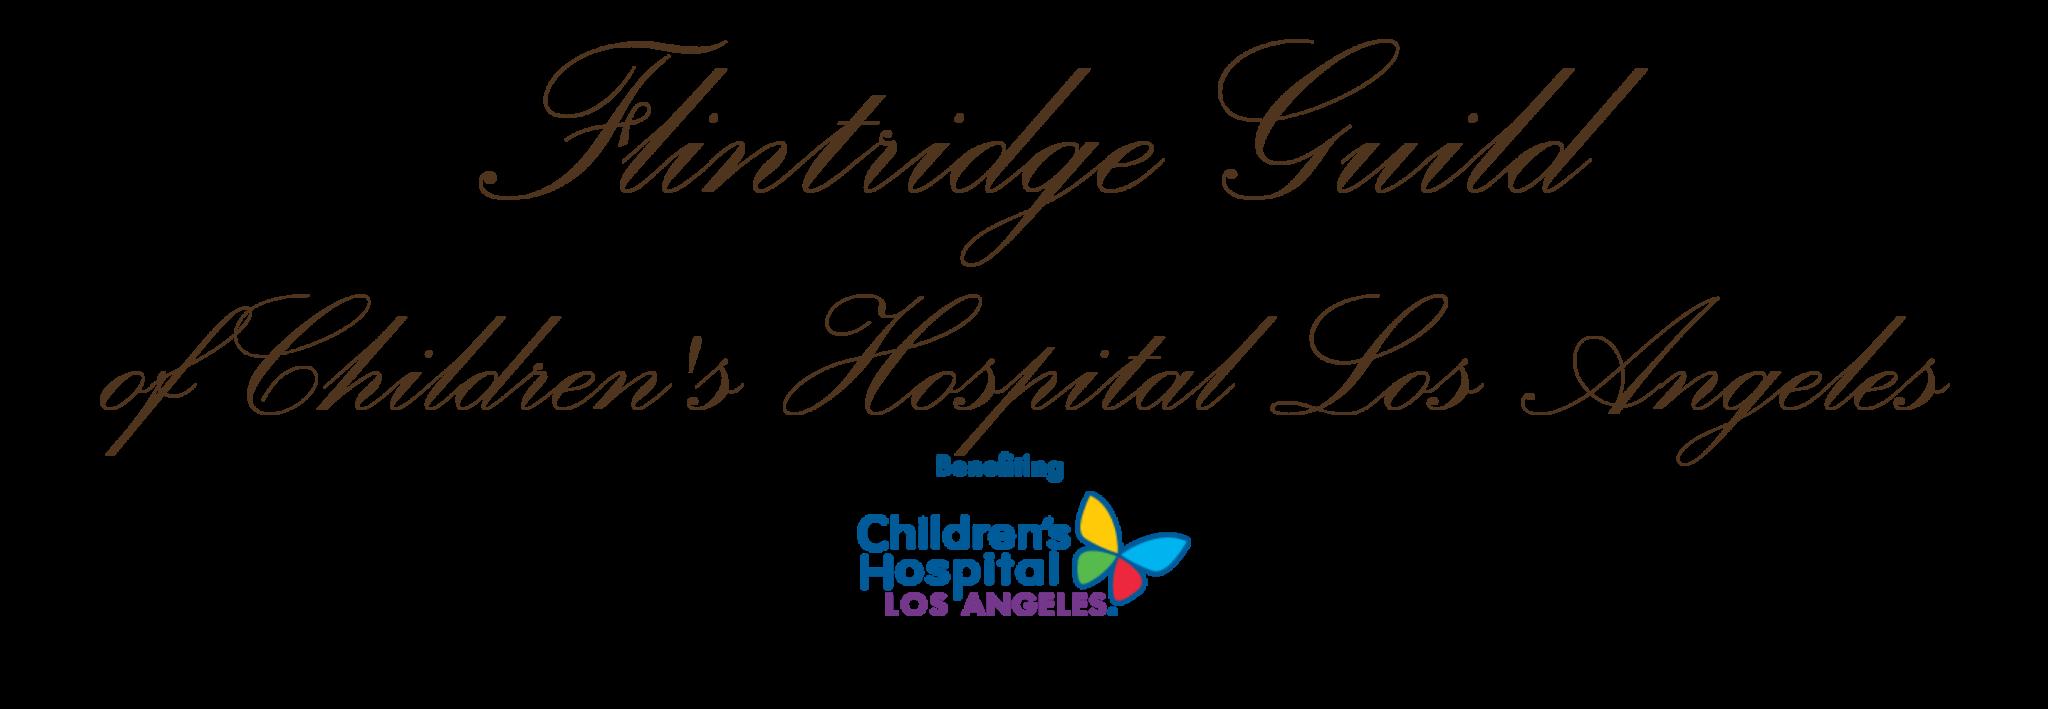 Flintridge Guild of Children's Hospital Los Angeles